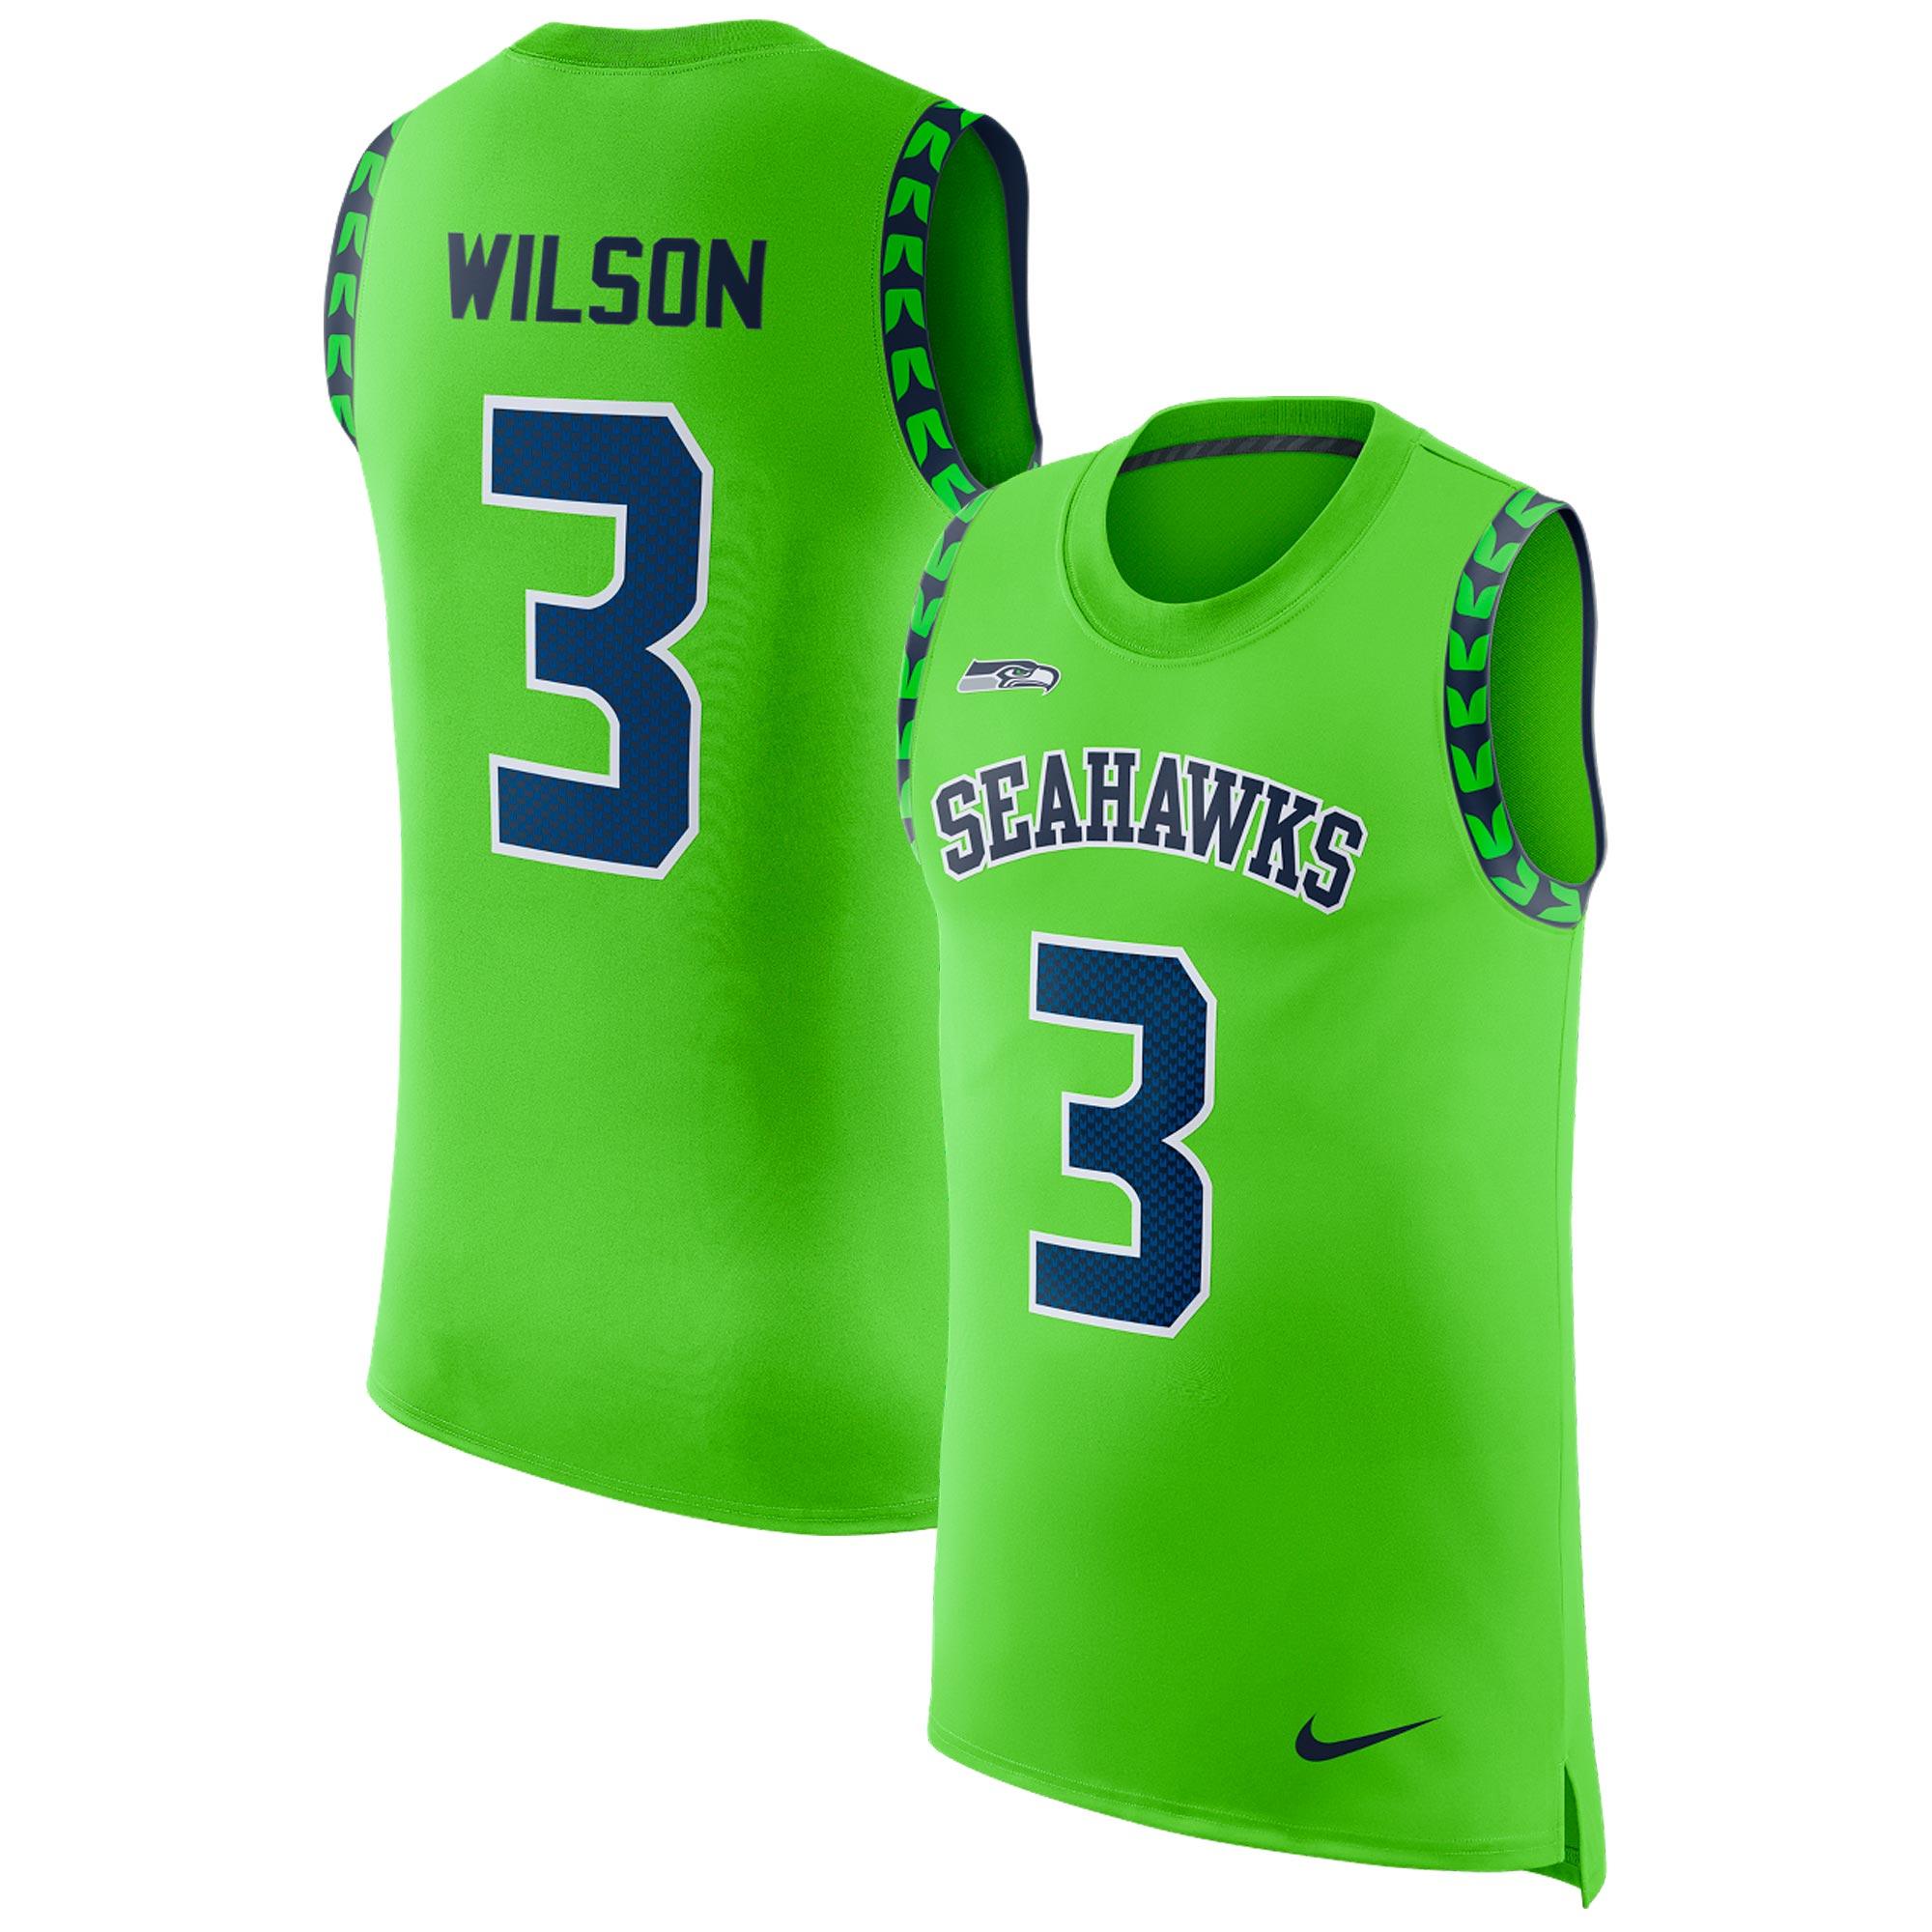 Seattle Seahawks Russell Wilson Color Rush Spieler-Tanktop – Herren